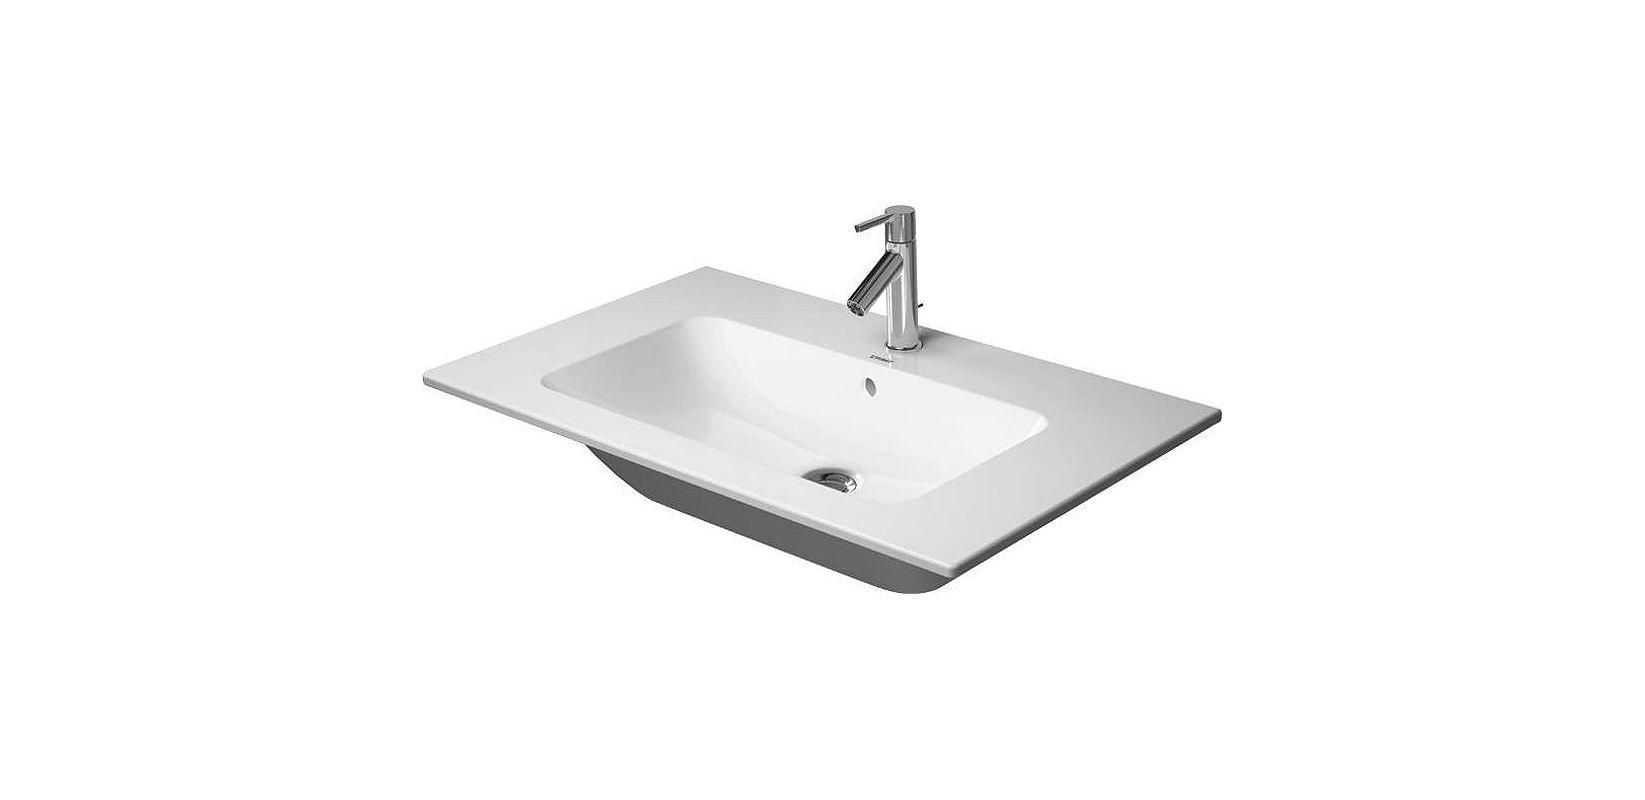 duravit click to view larger image - Duravit Sink